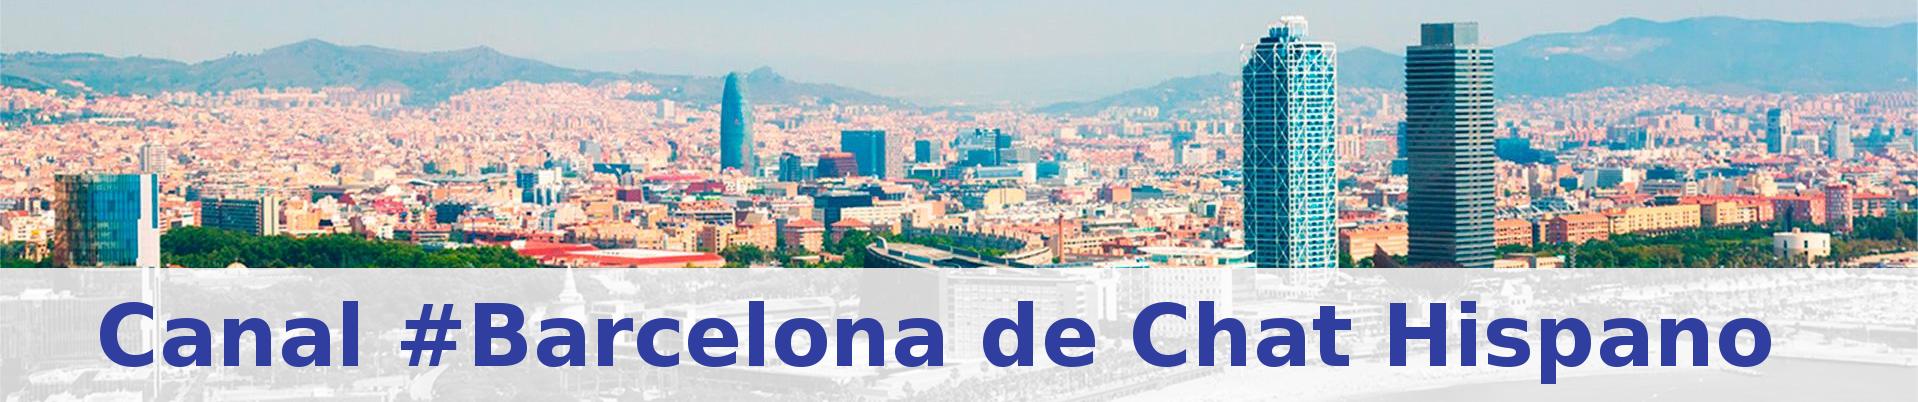 Canal #Barcelona de l'iRC-Hispano